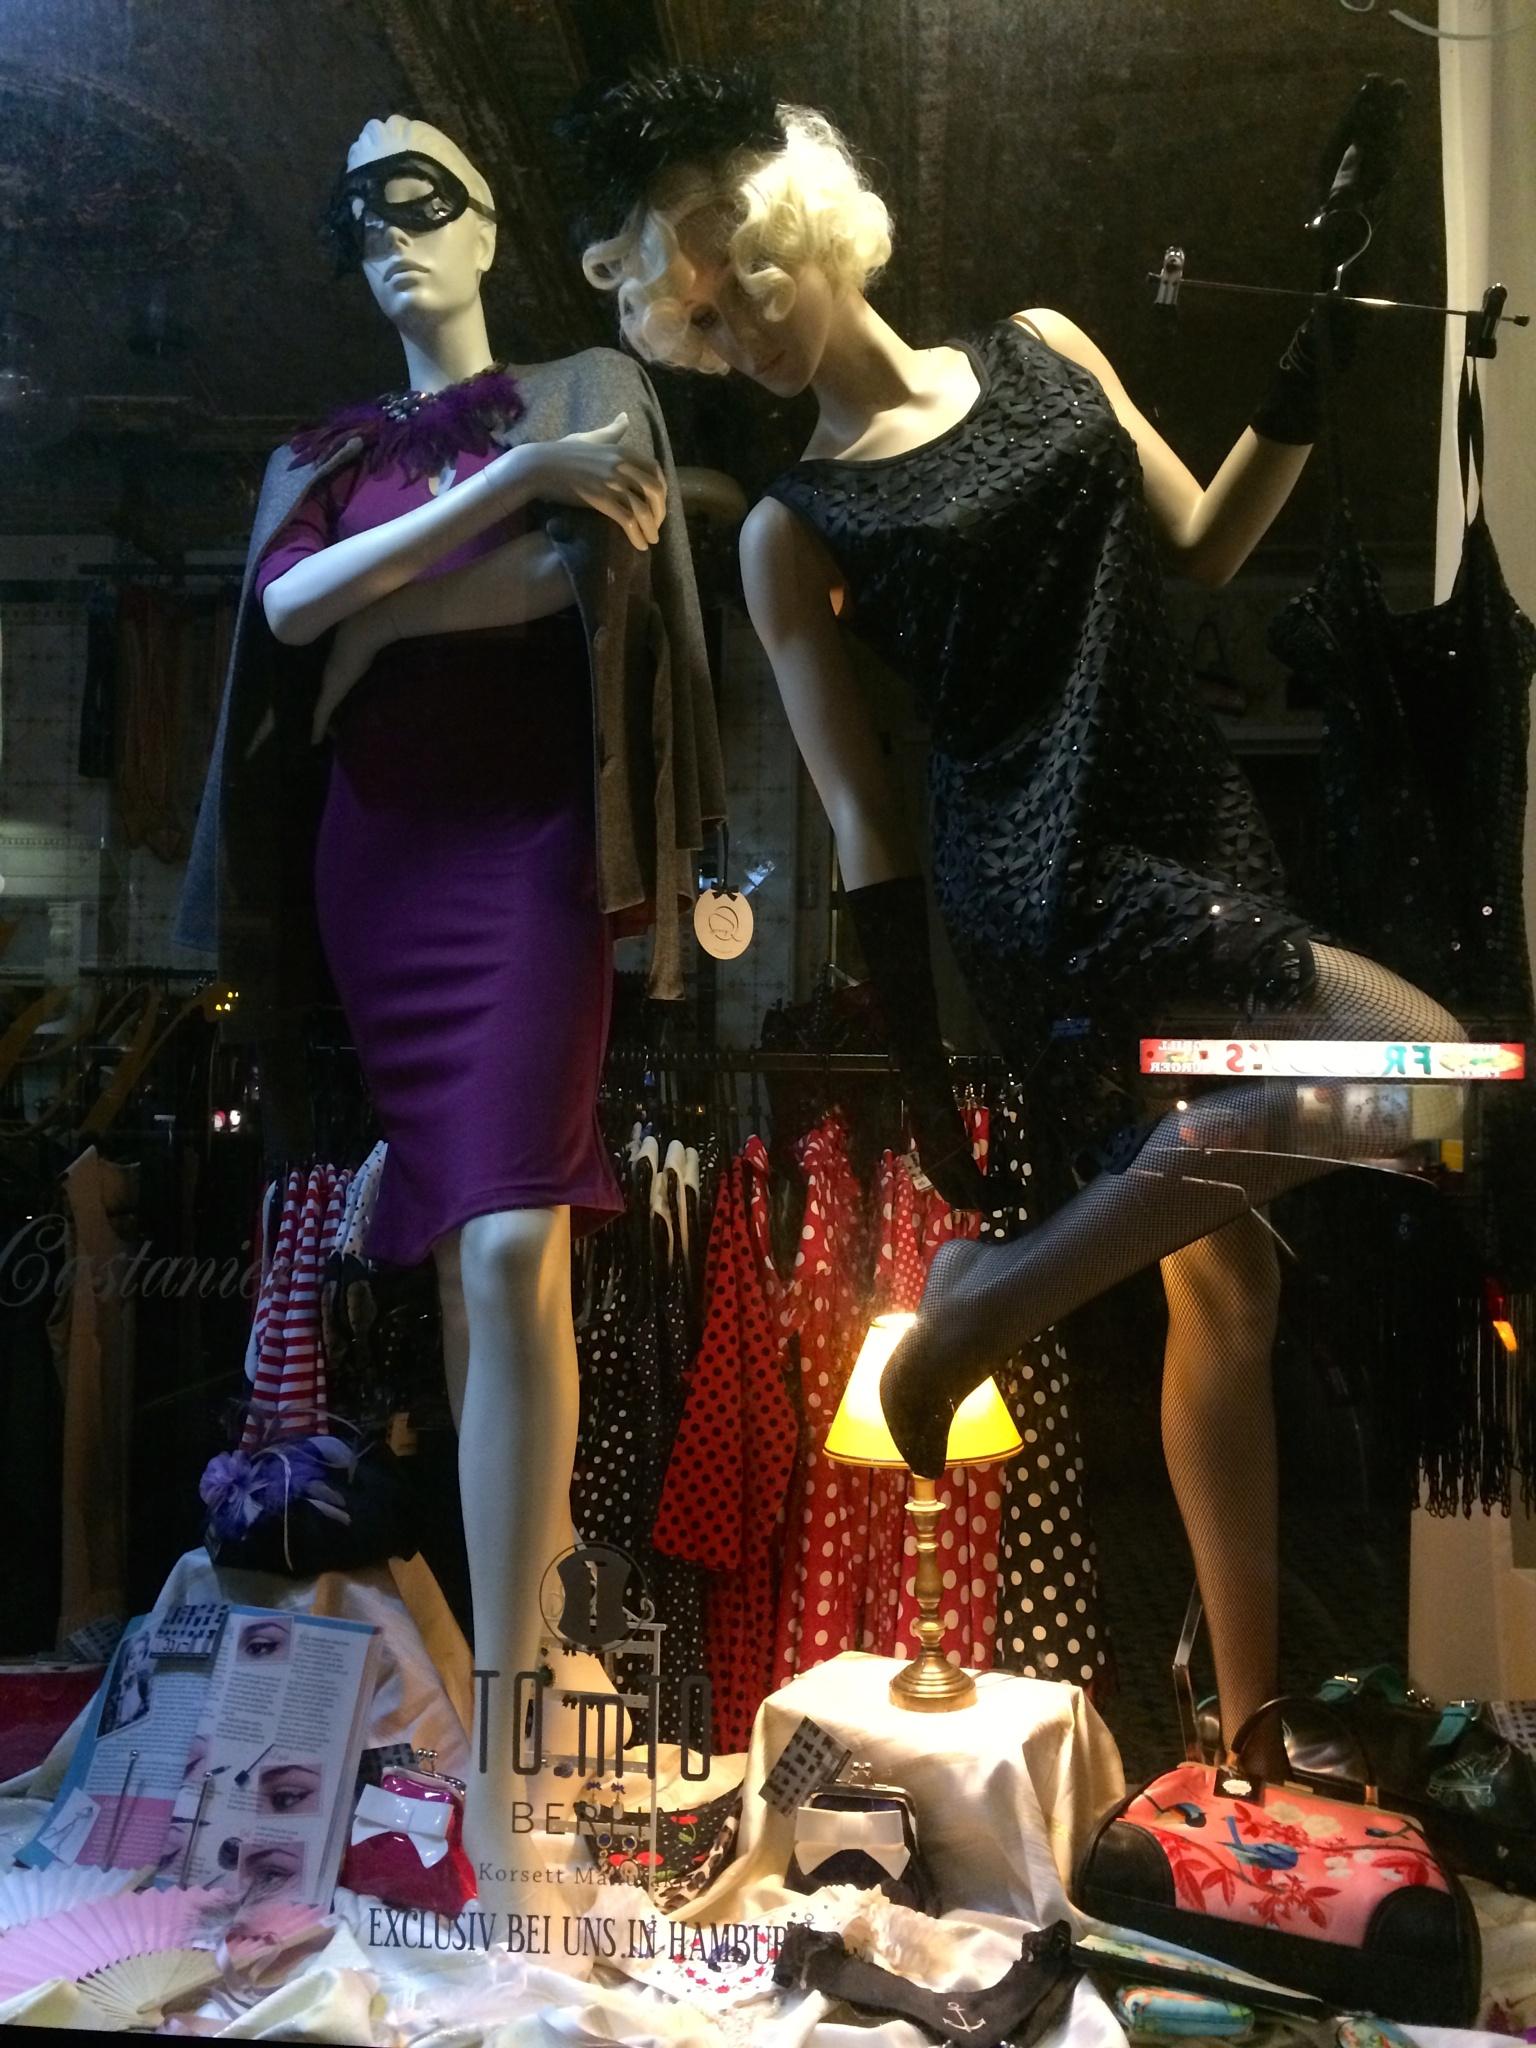 cool dresses by m.etemadieh